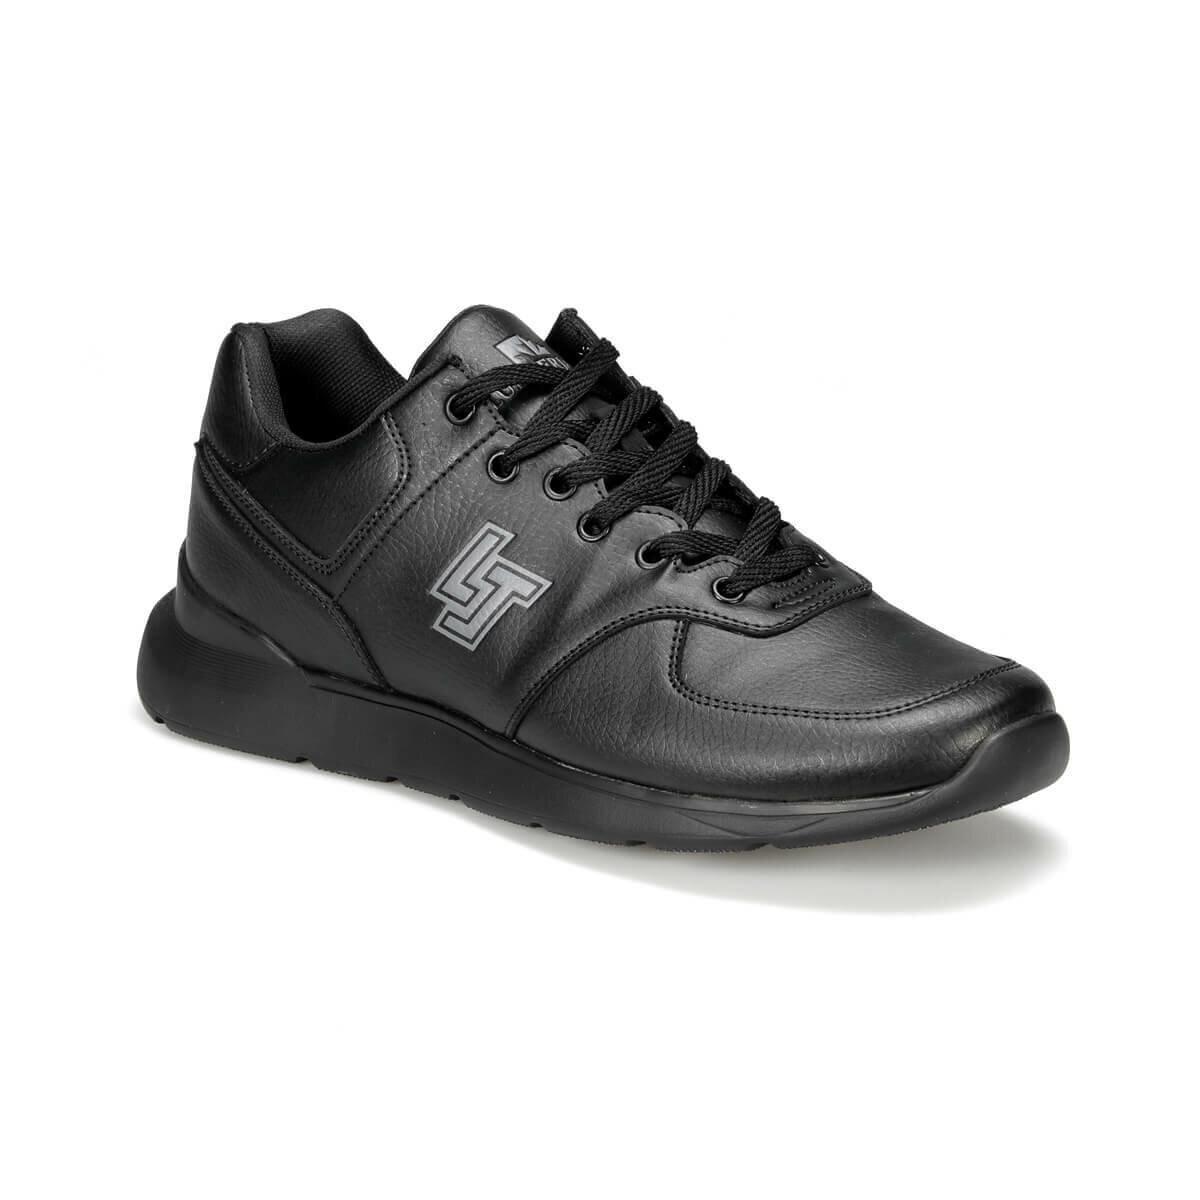 FLO LAOS 9PR Black Men 'S Sneaker Shoes LUMBERJACK